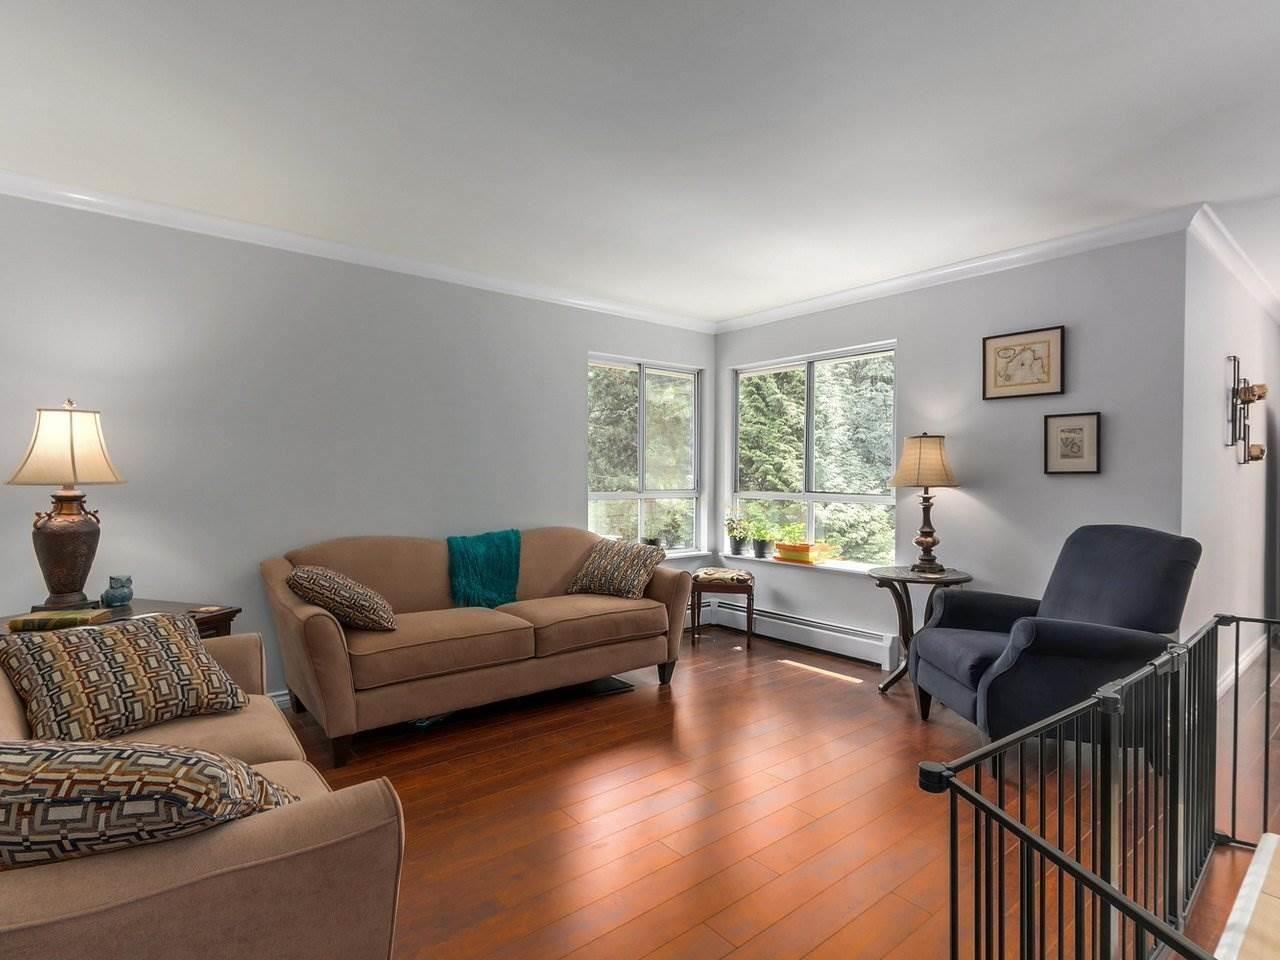 Buliding: 9000 Ash Grove Crescent, Burnaby, BC